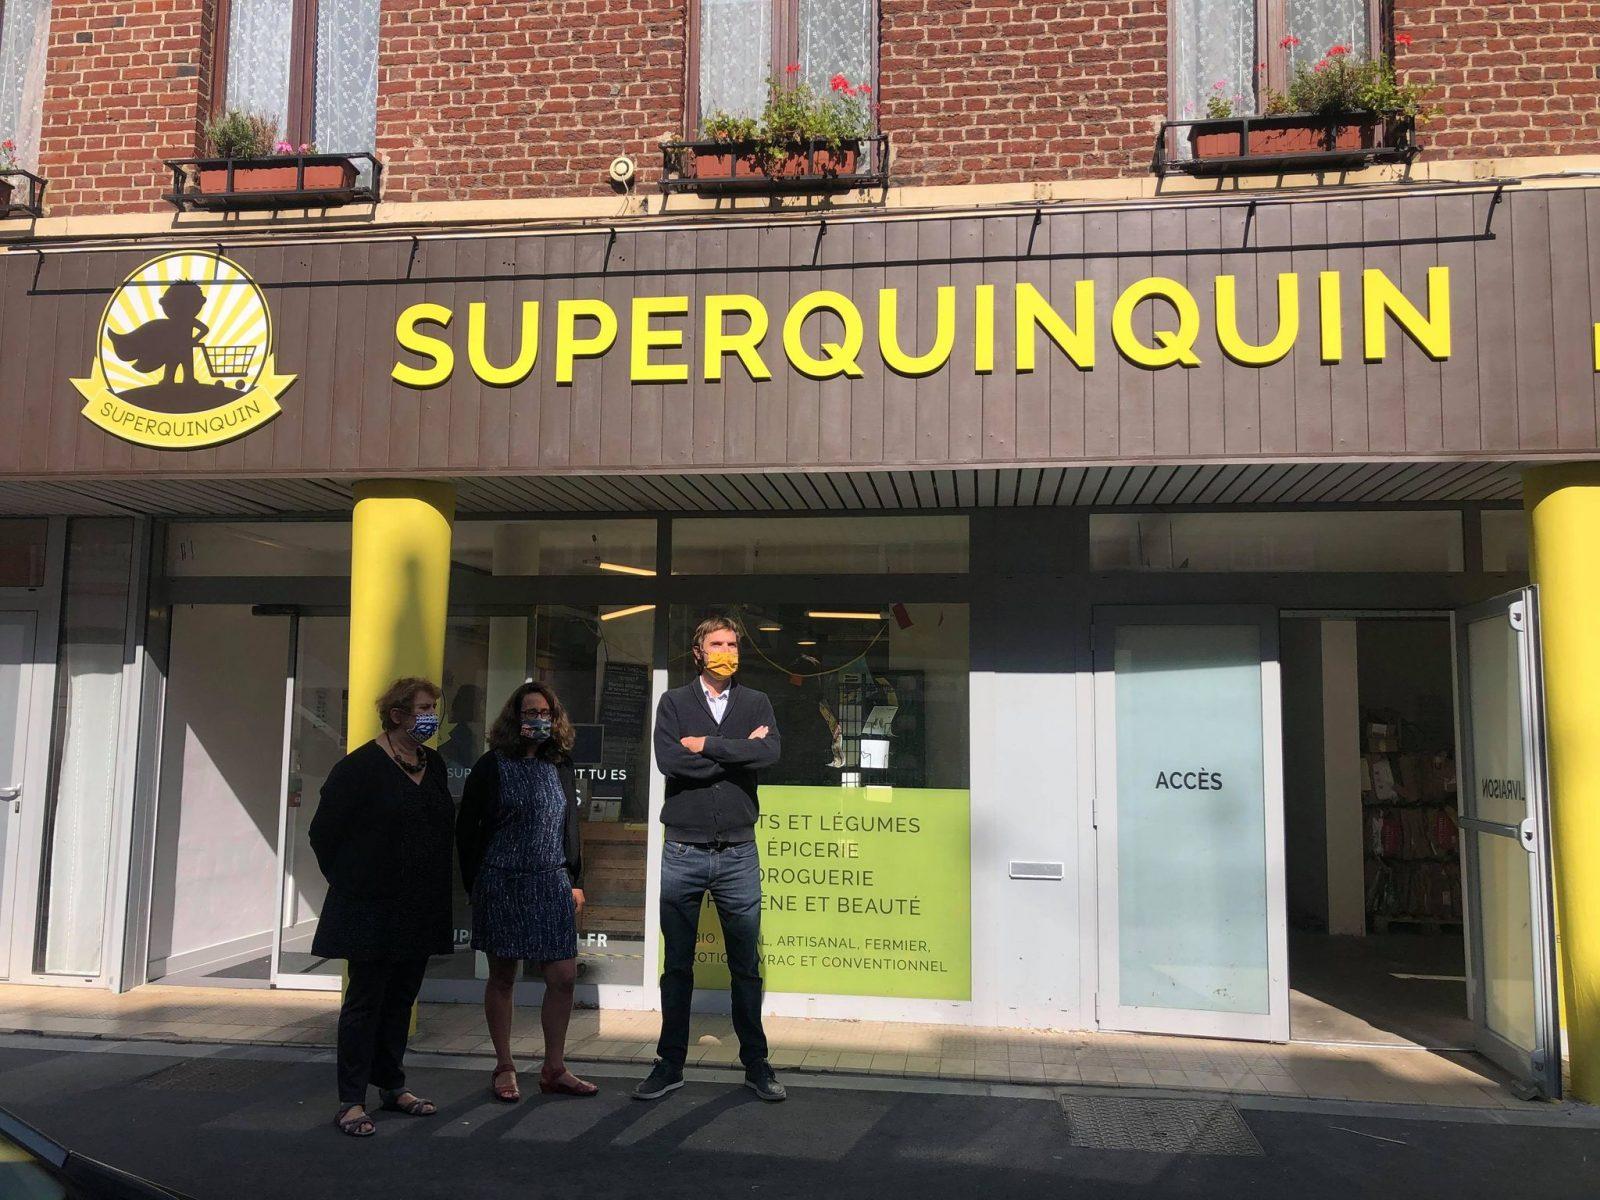 Façade du supermarché SuperQuinquin